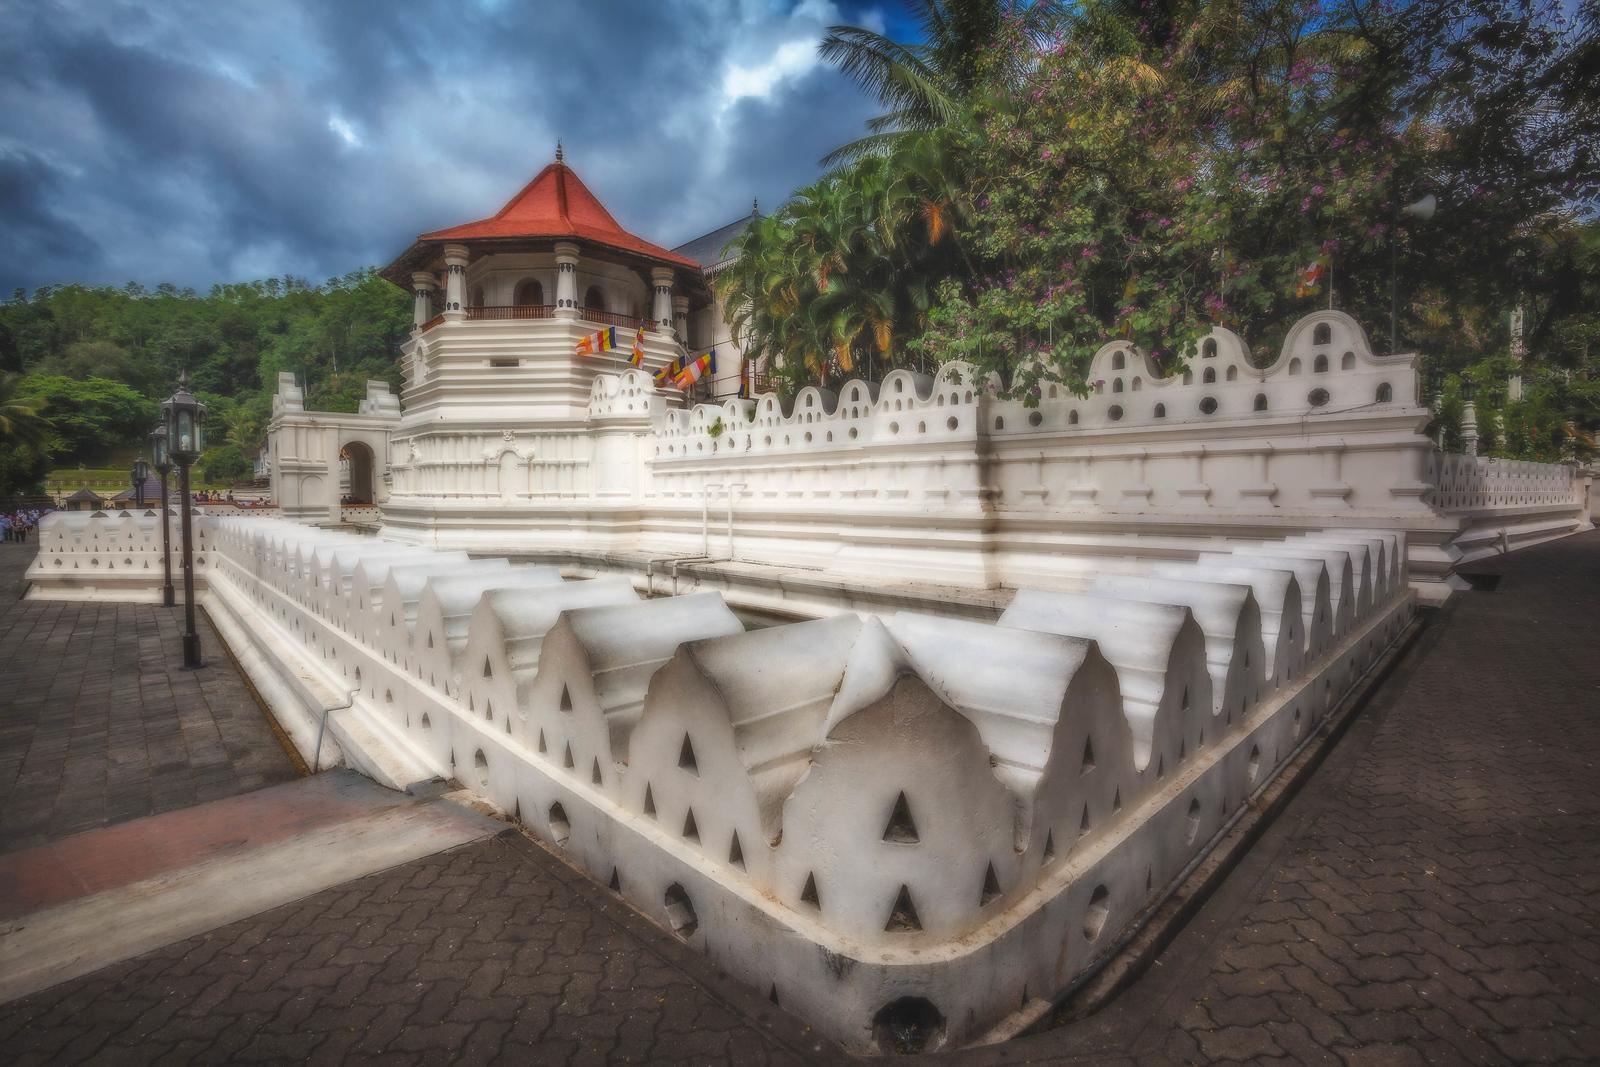 The Royal Palace of Kandy in Sri Lanka